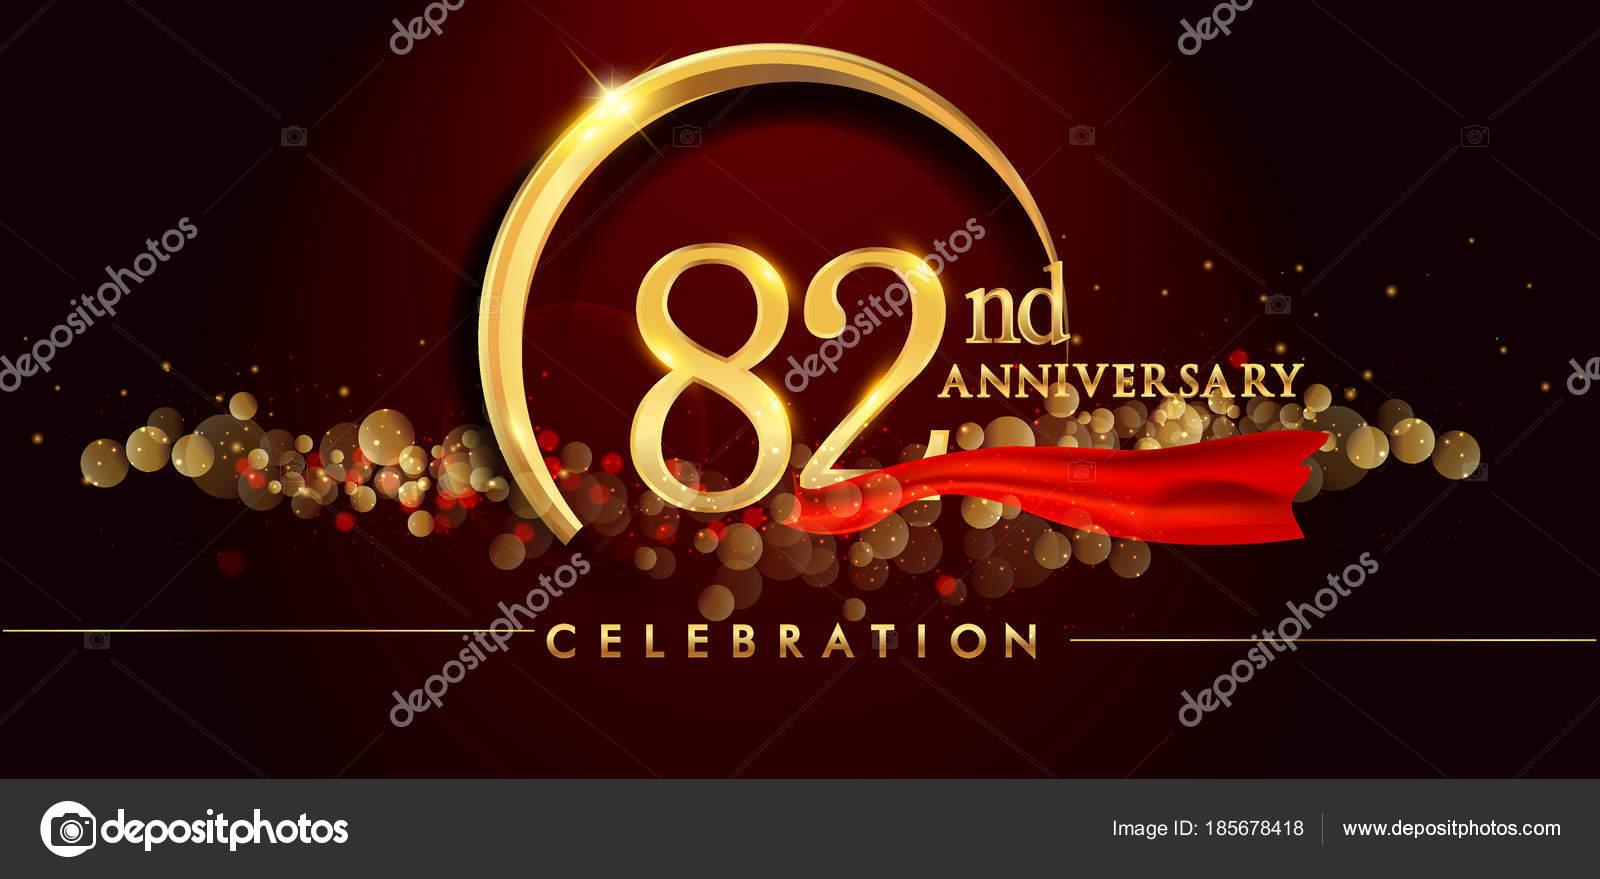 Nd anniversary logo golden ring confetti red ribbon elegant